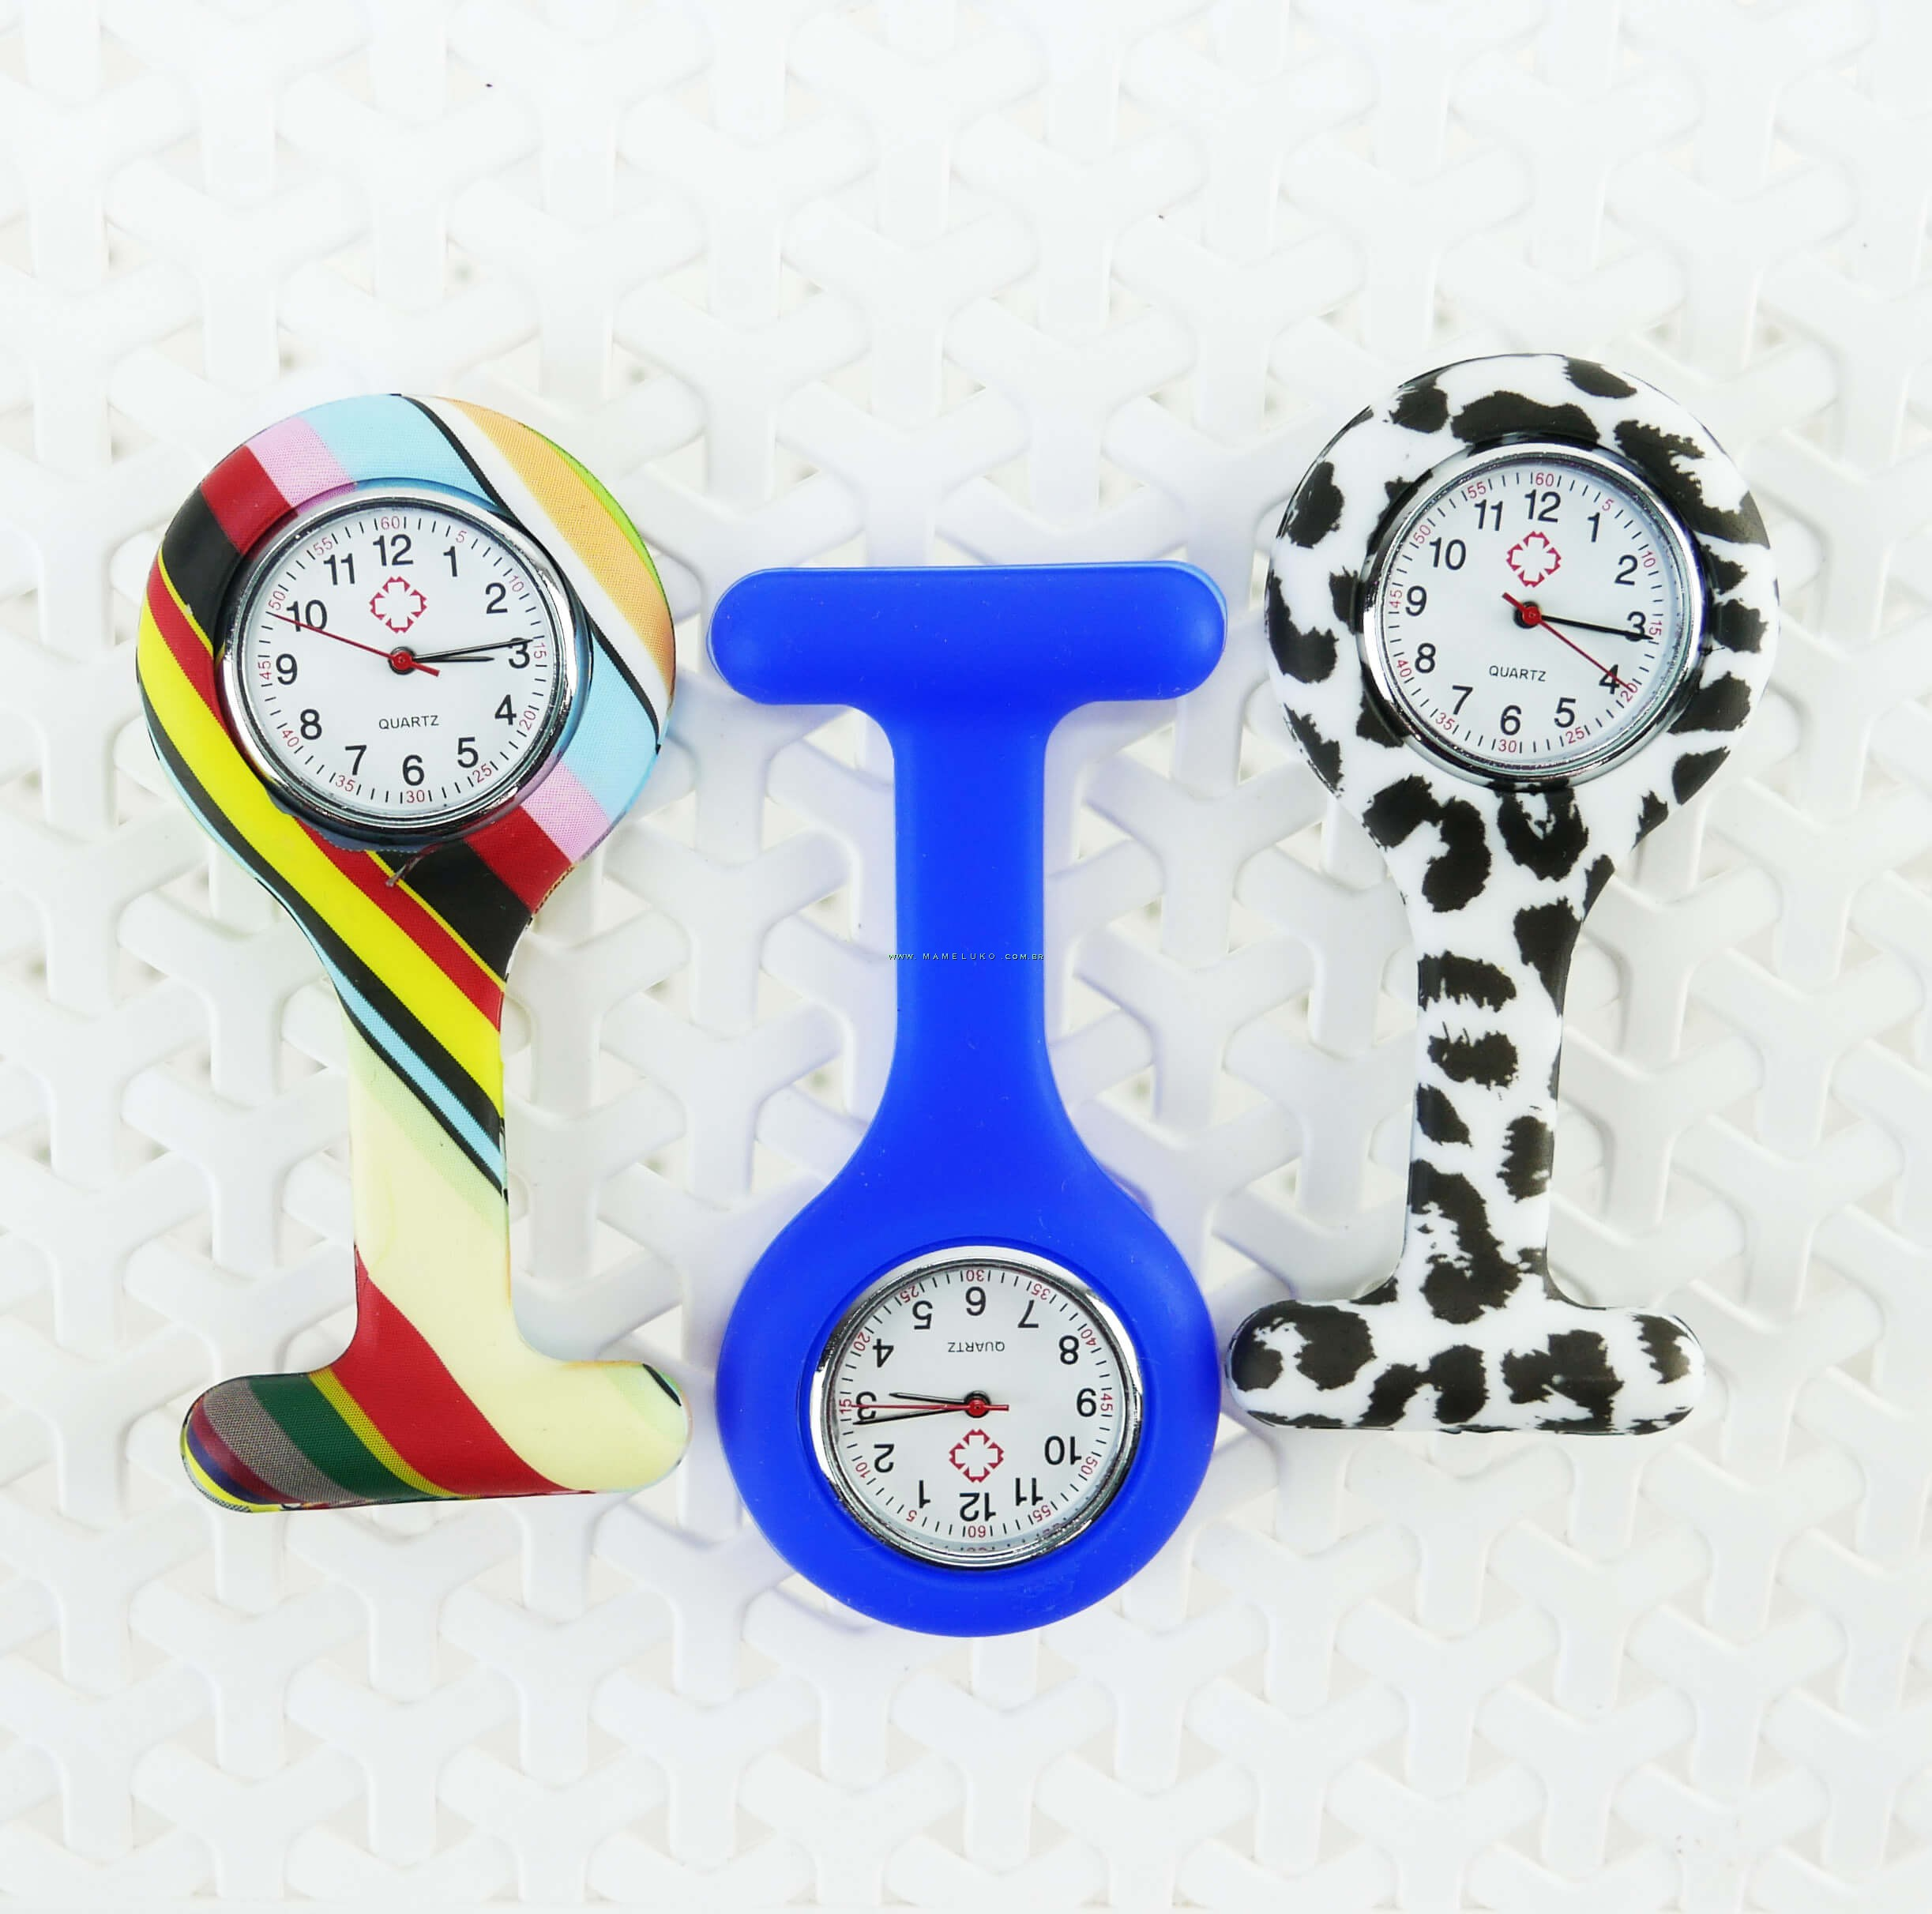 137ea2e2b27 ... Relógio de Jaleco Silicone Estampada Listras - Colorida ...